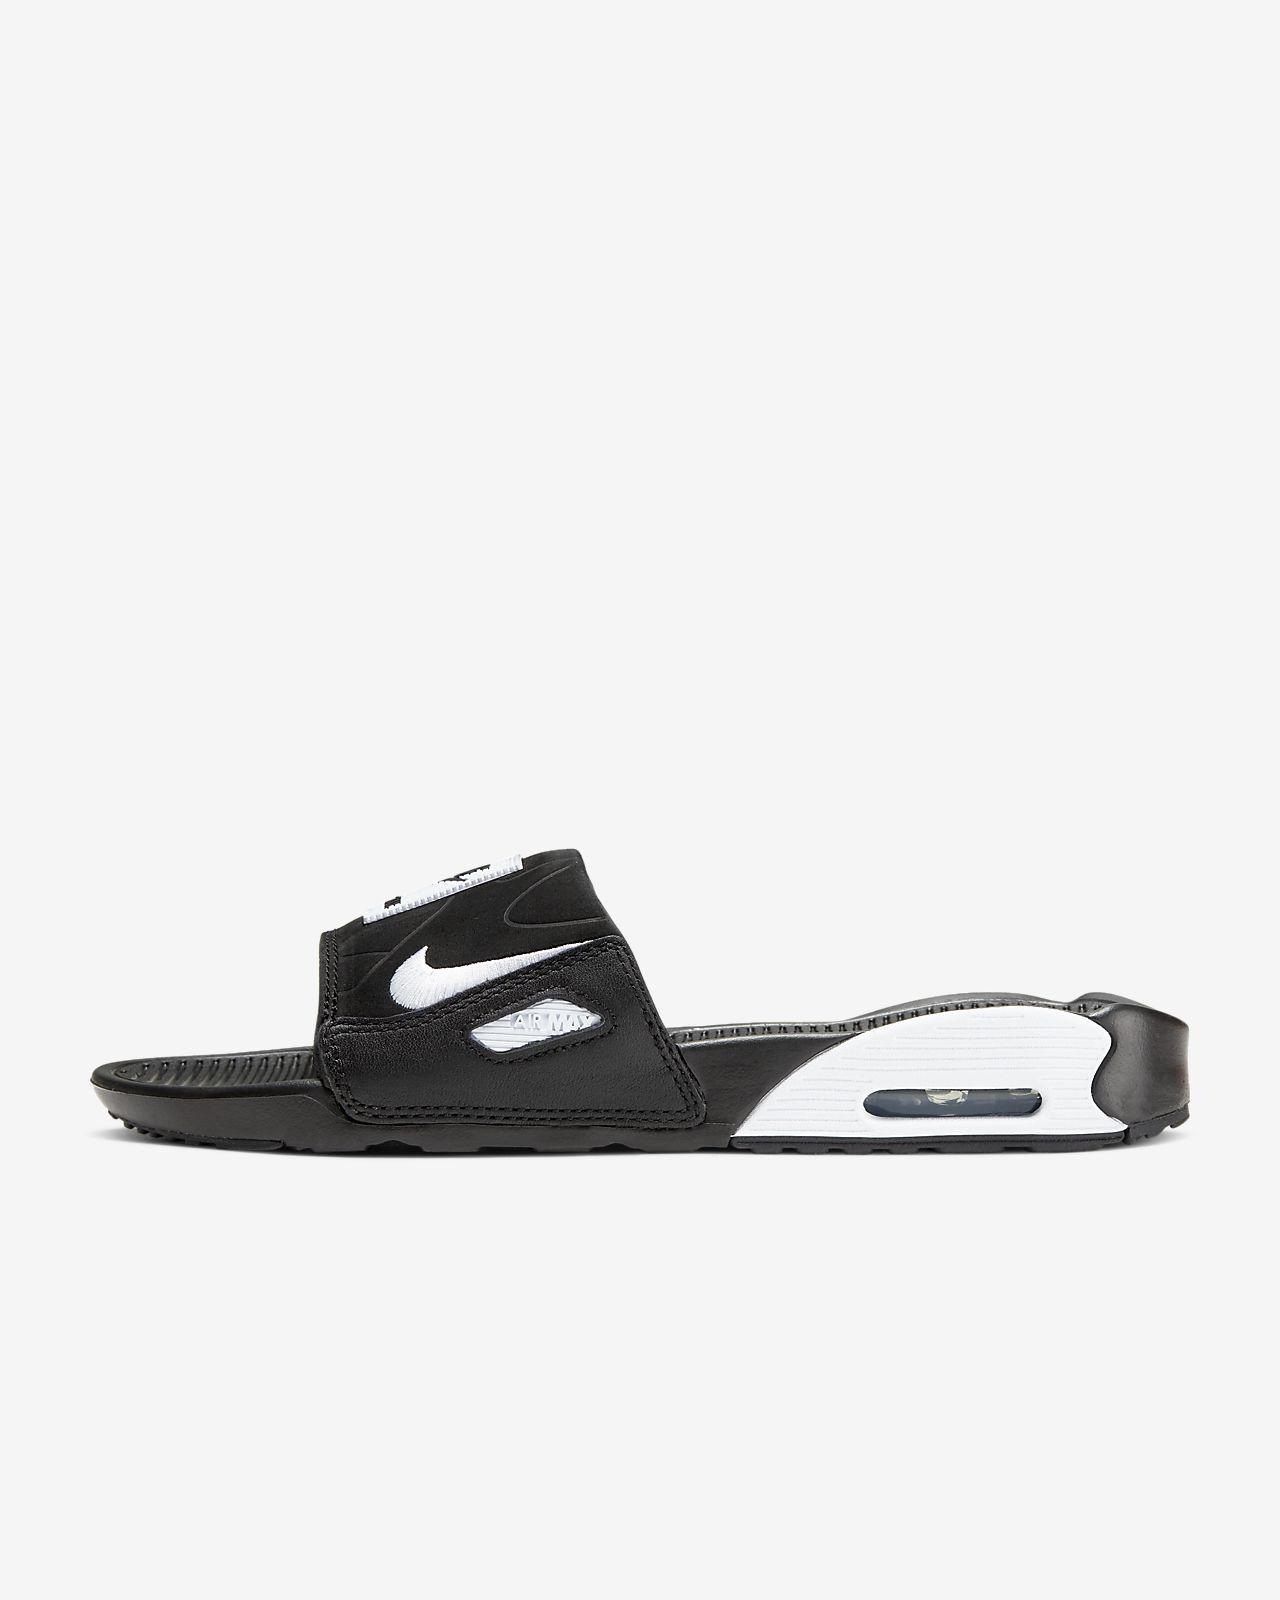 Claquette Nike Air Max 90 pour Femme